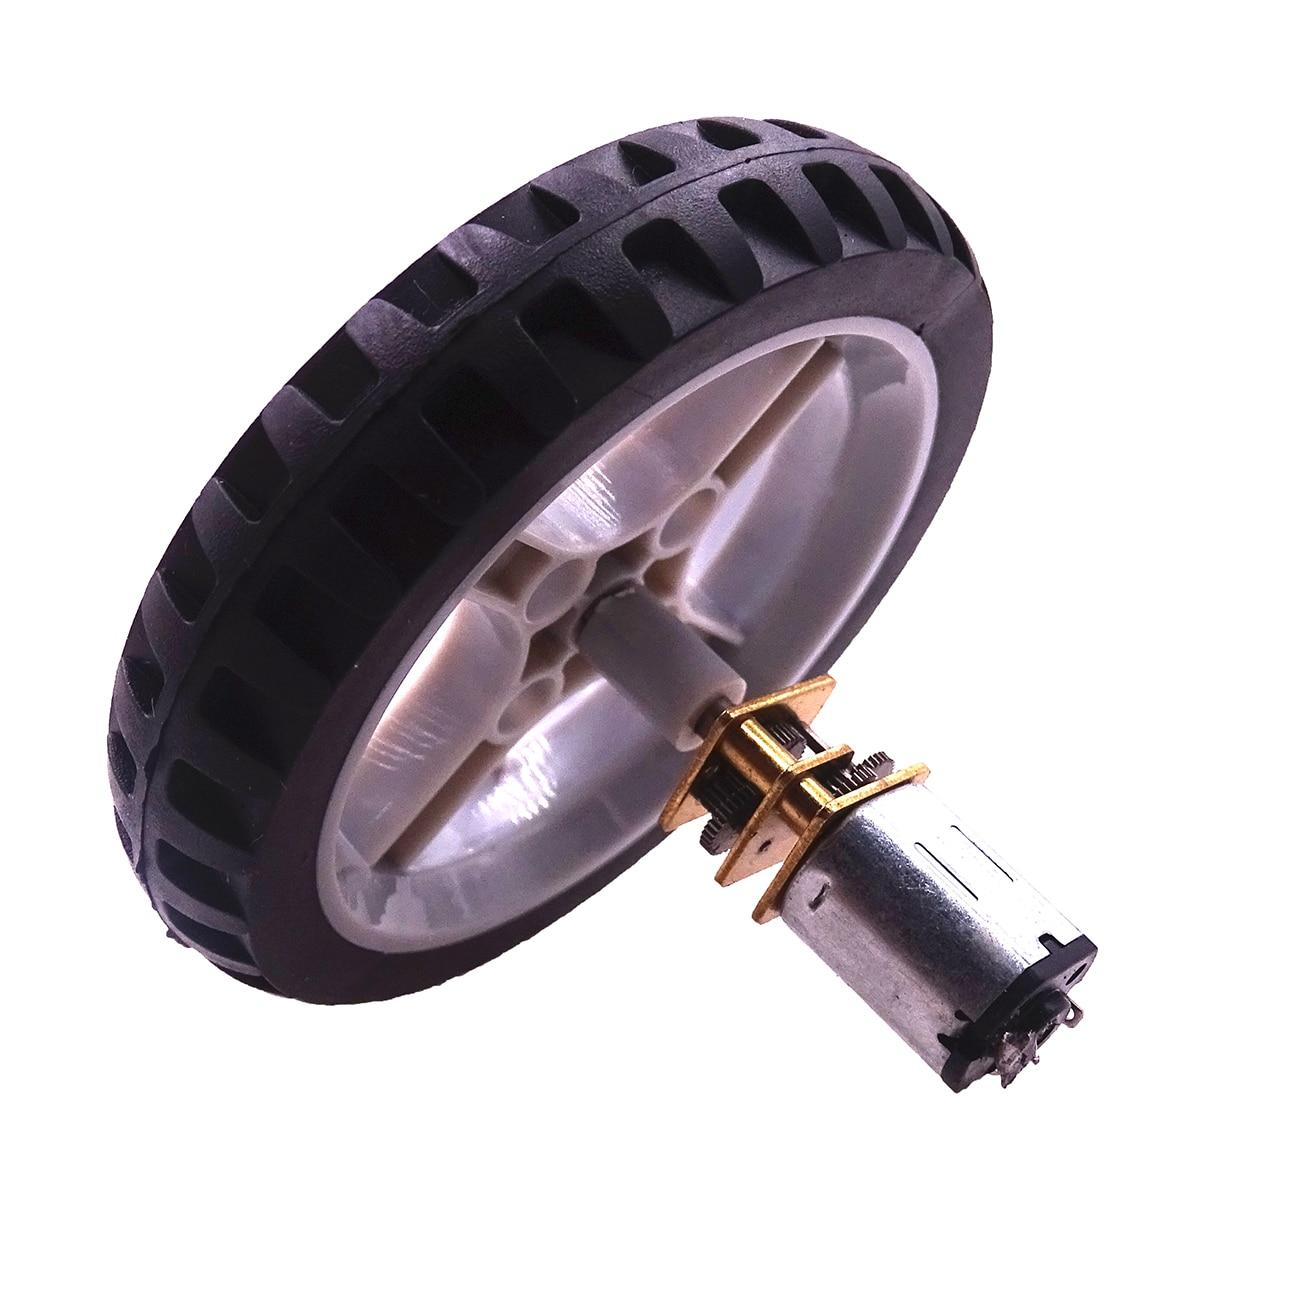 Car power kit DC 3V 6V 12V Encoder Motor Gear N20 Electric Micro Gear Motor with Wheel Screws Mounting Bracket Coupling Kit